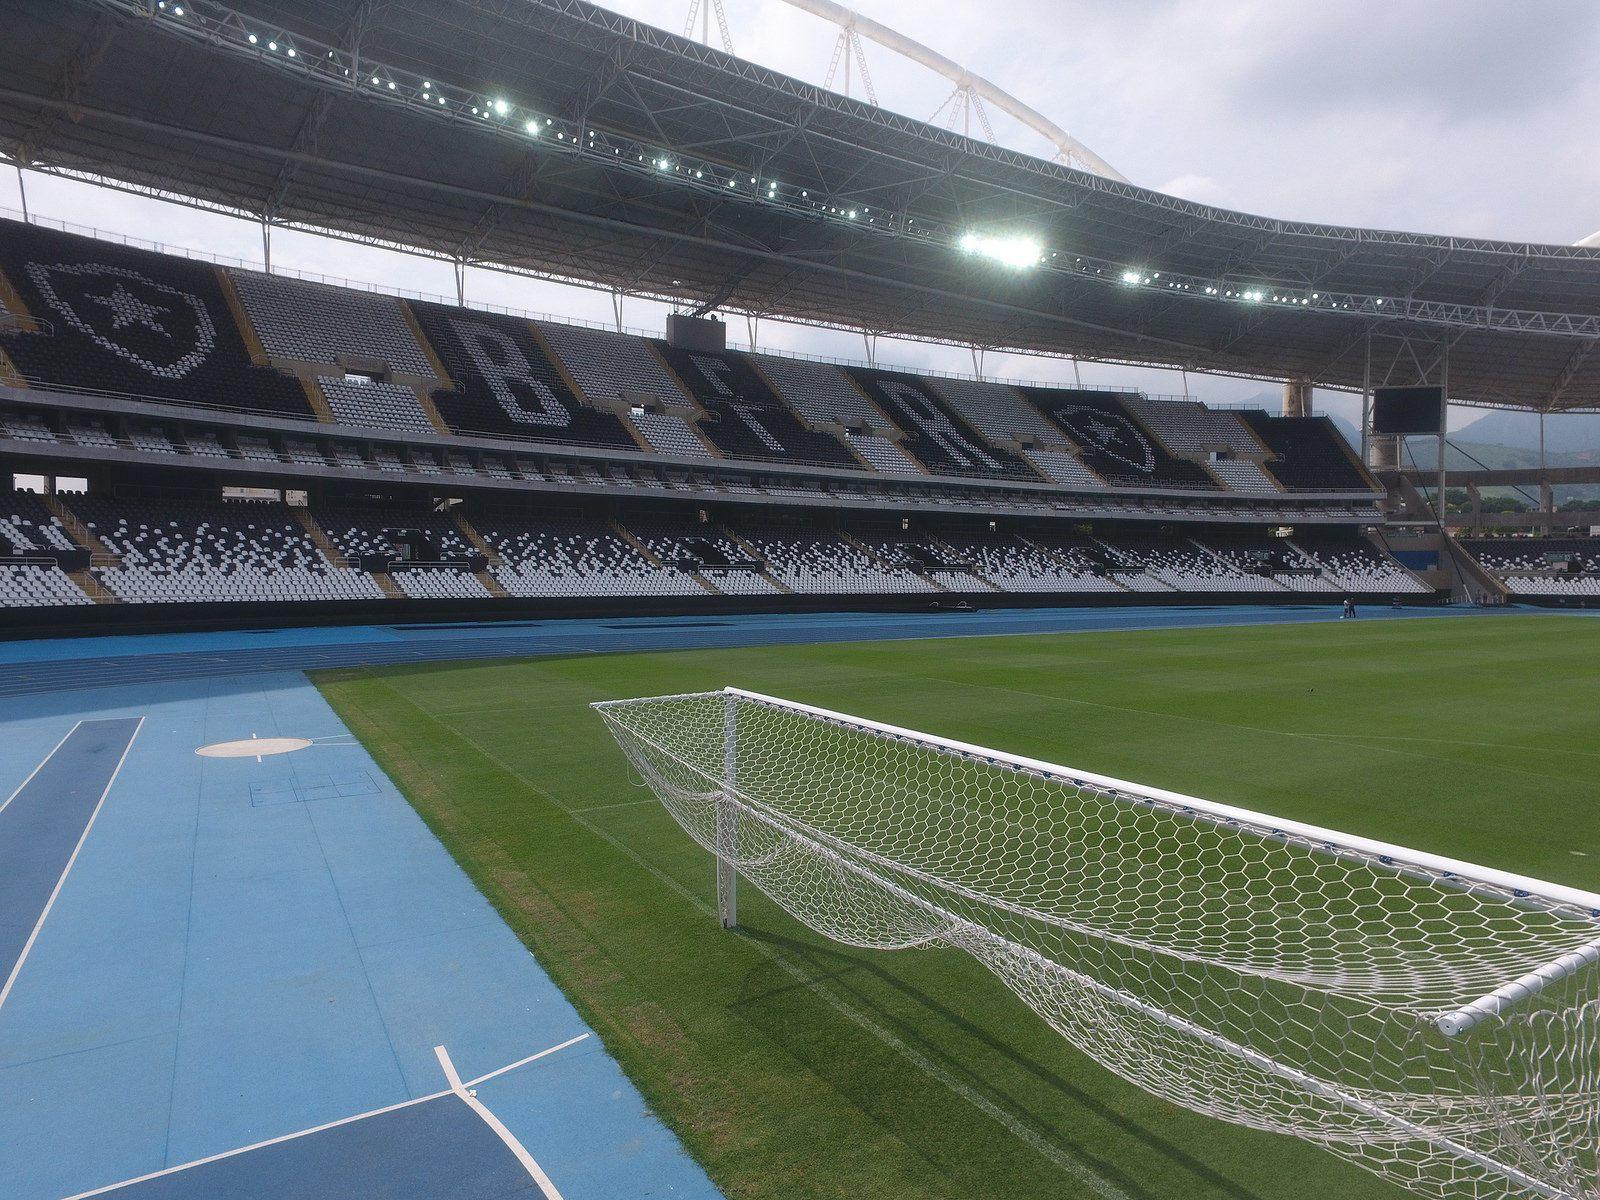 Estádio Nilton Santos Engenh£o – StadiumDB